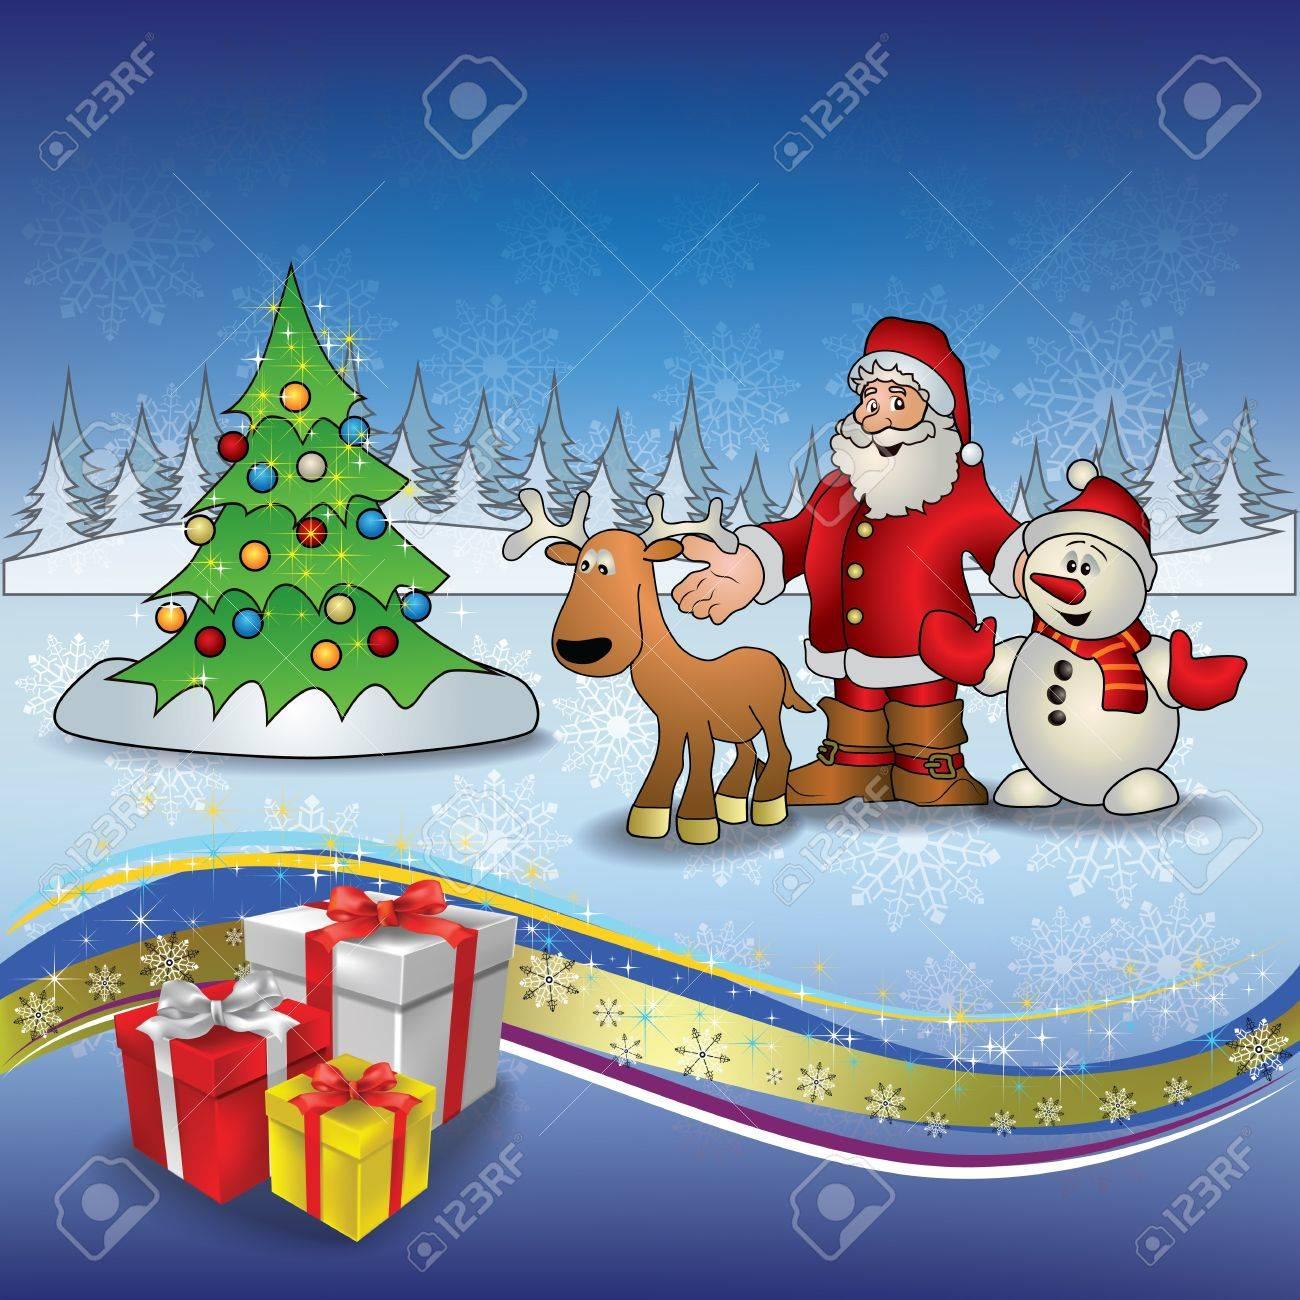 Abstract Christmas greeting with Santa deer snowmen and tree Stock Vector - 10399376